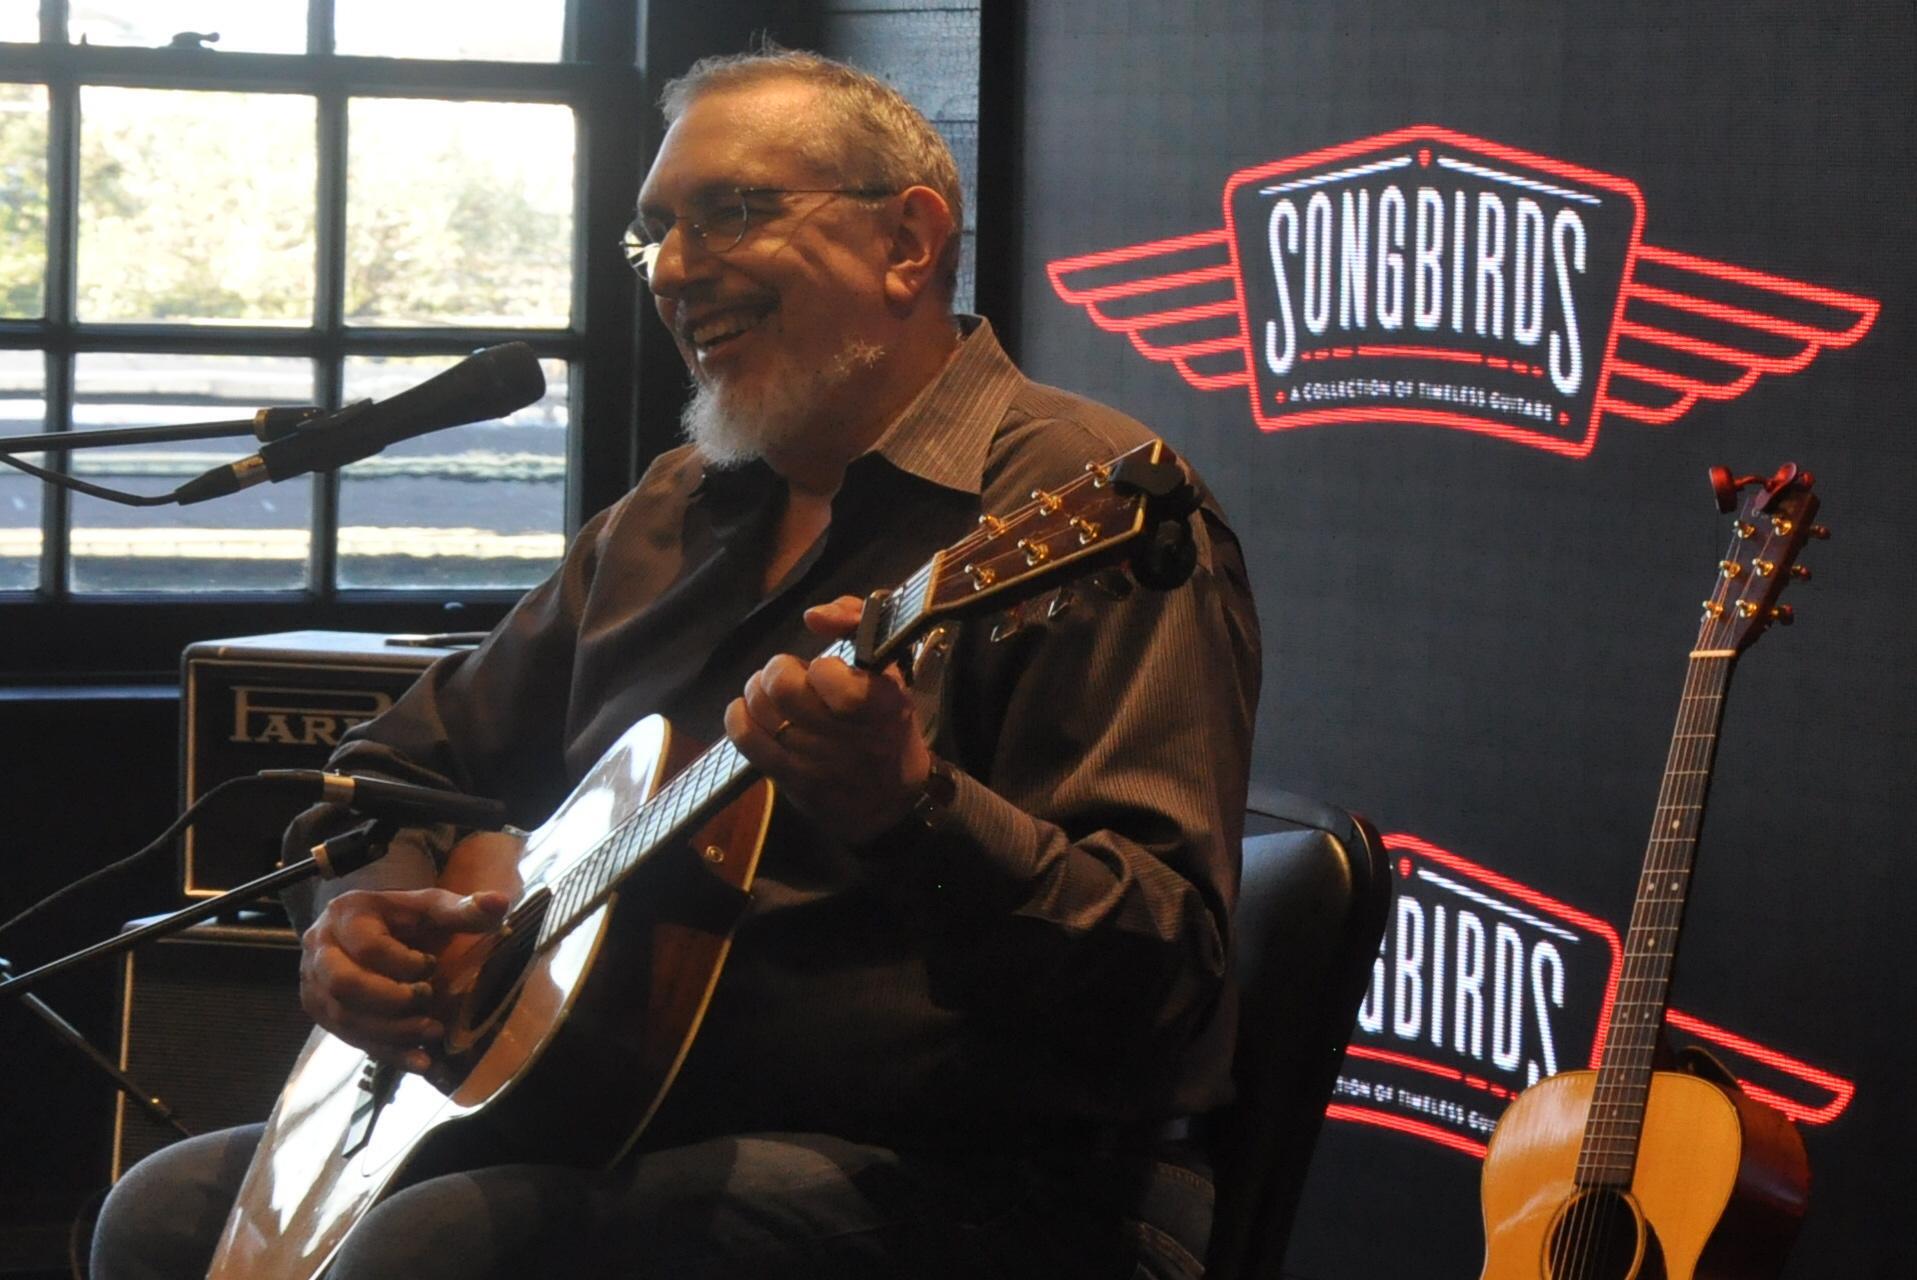 Who doesn't love guitars? Songbirds celebrates the Axe.